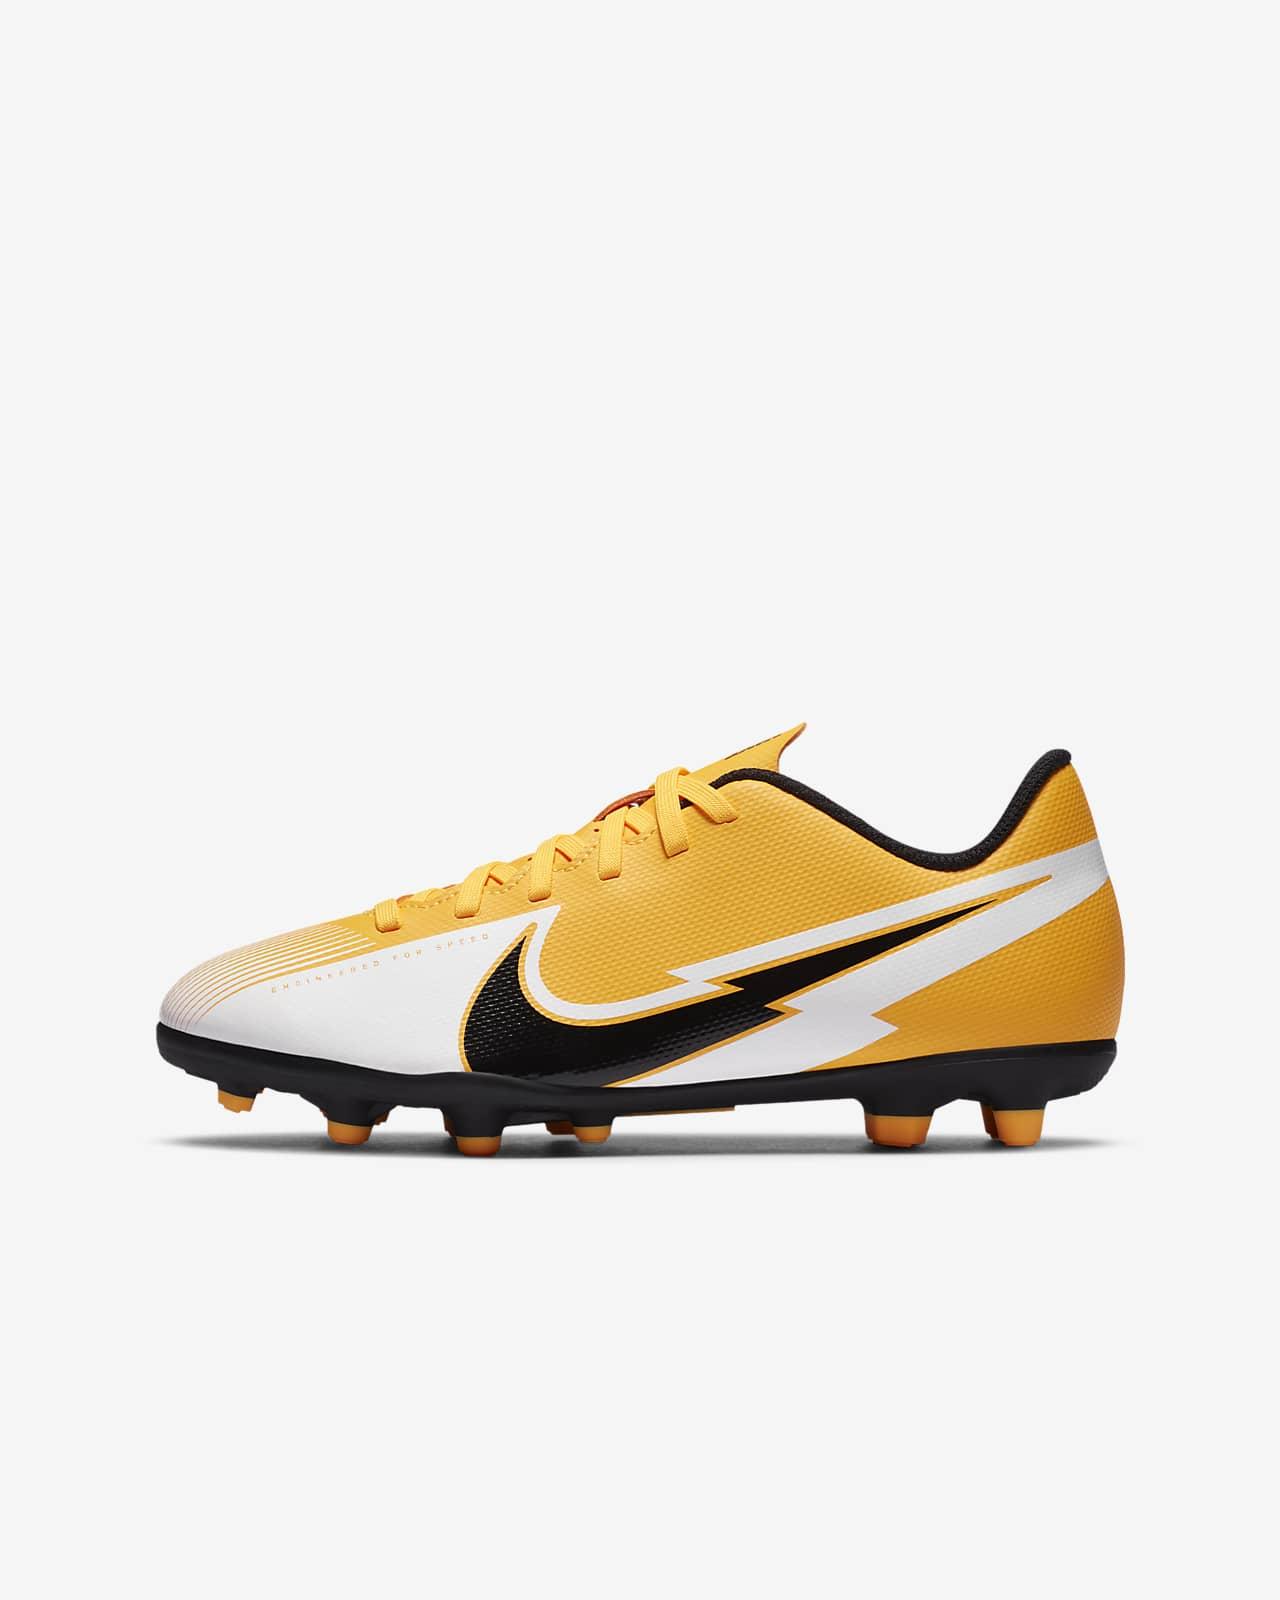 Scarpa da calcio multiterreno Nike Jr. Mercurial Vapor 13 Club MG - Bambini/Ragazzi